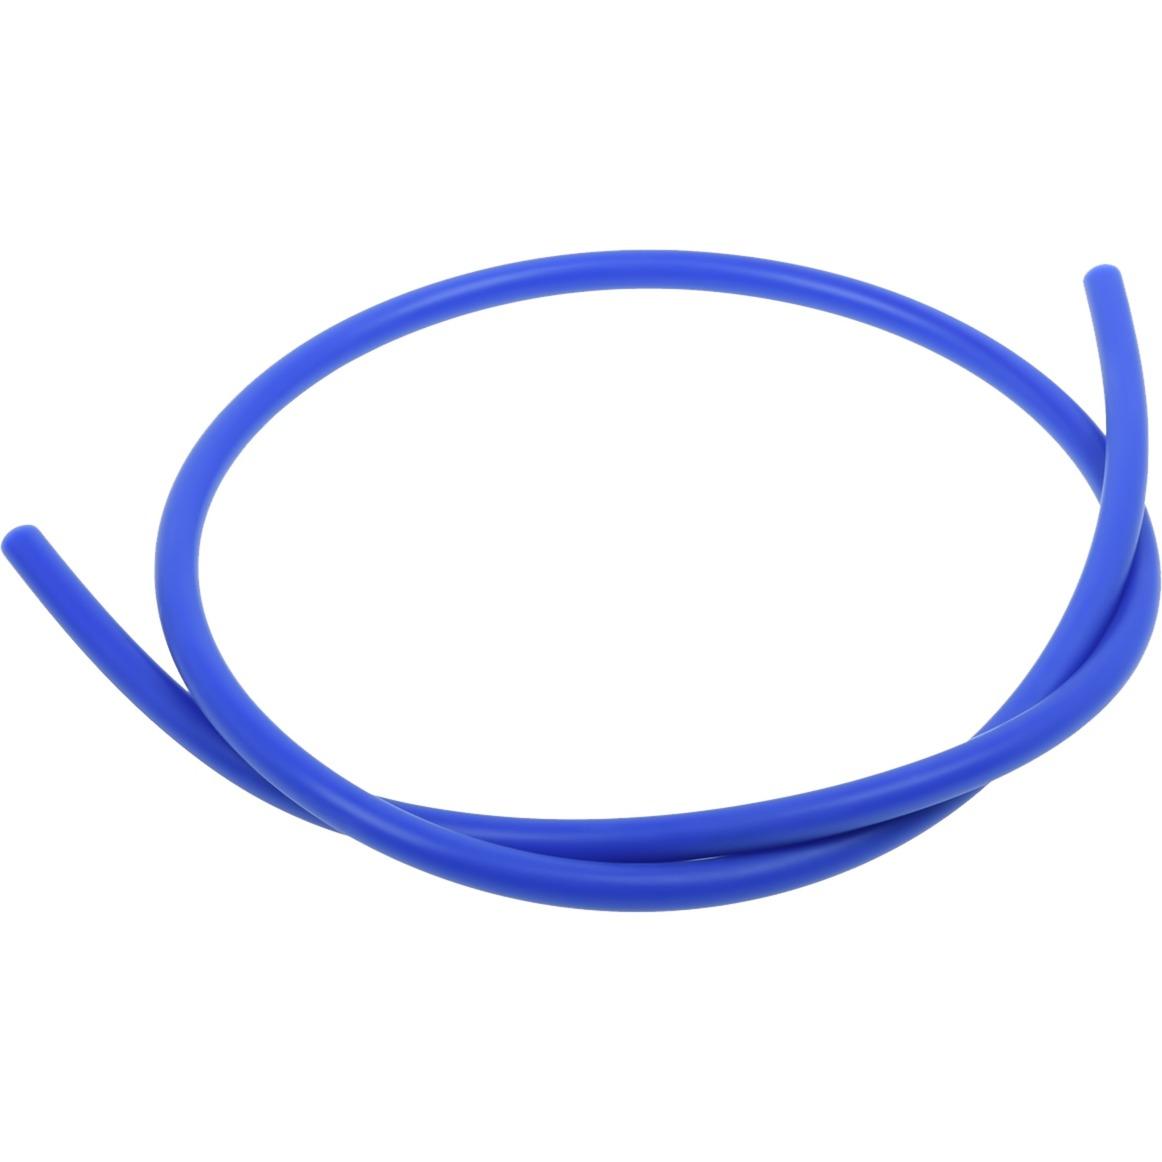 29117 1m Azul manguera de compresores de aire, Refrigeración por agua